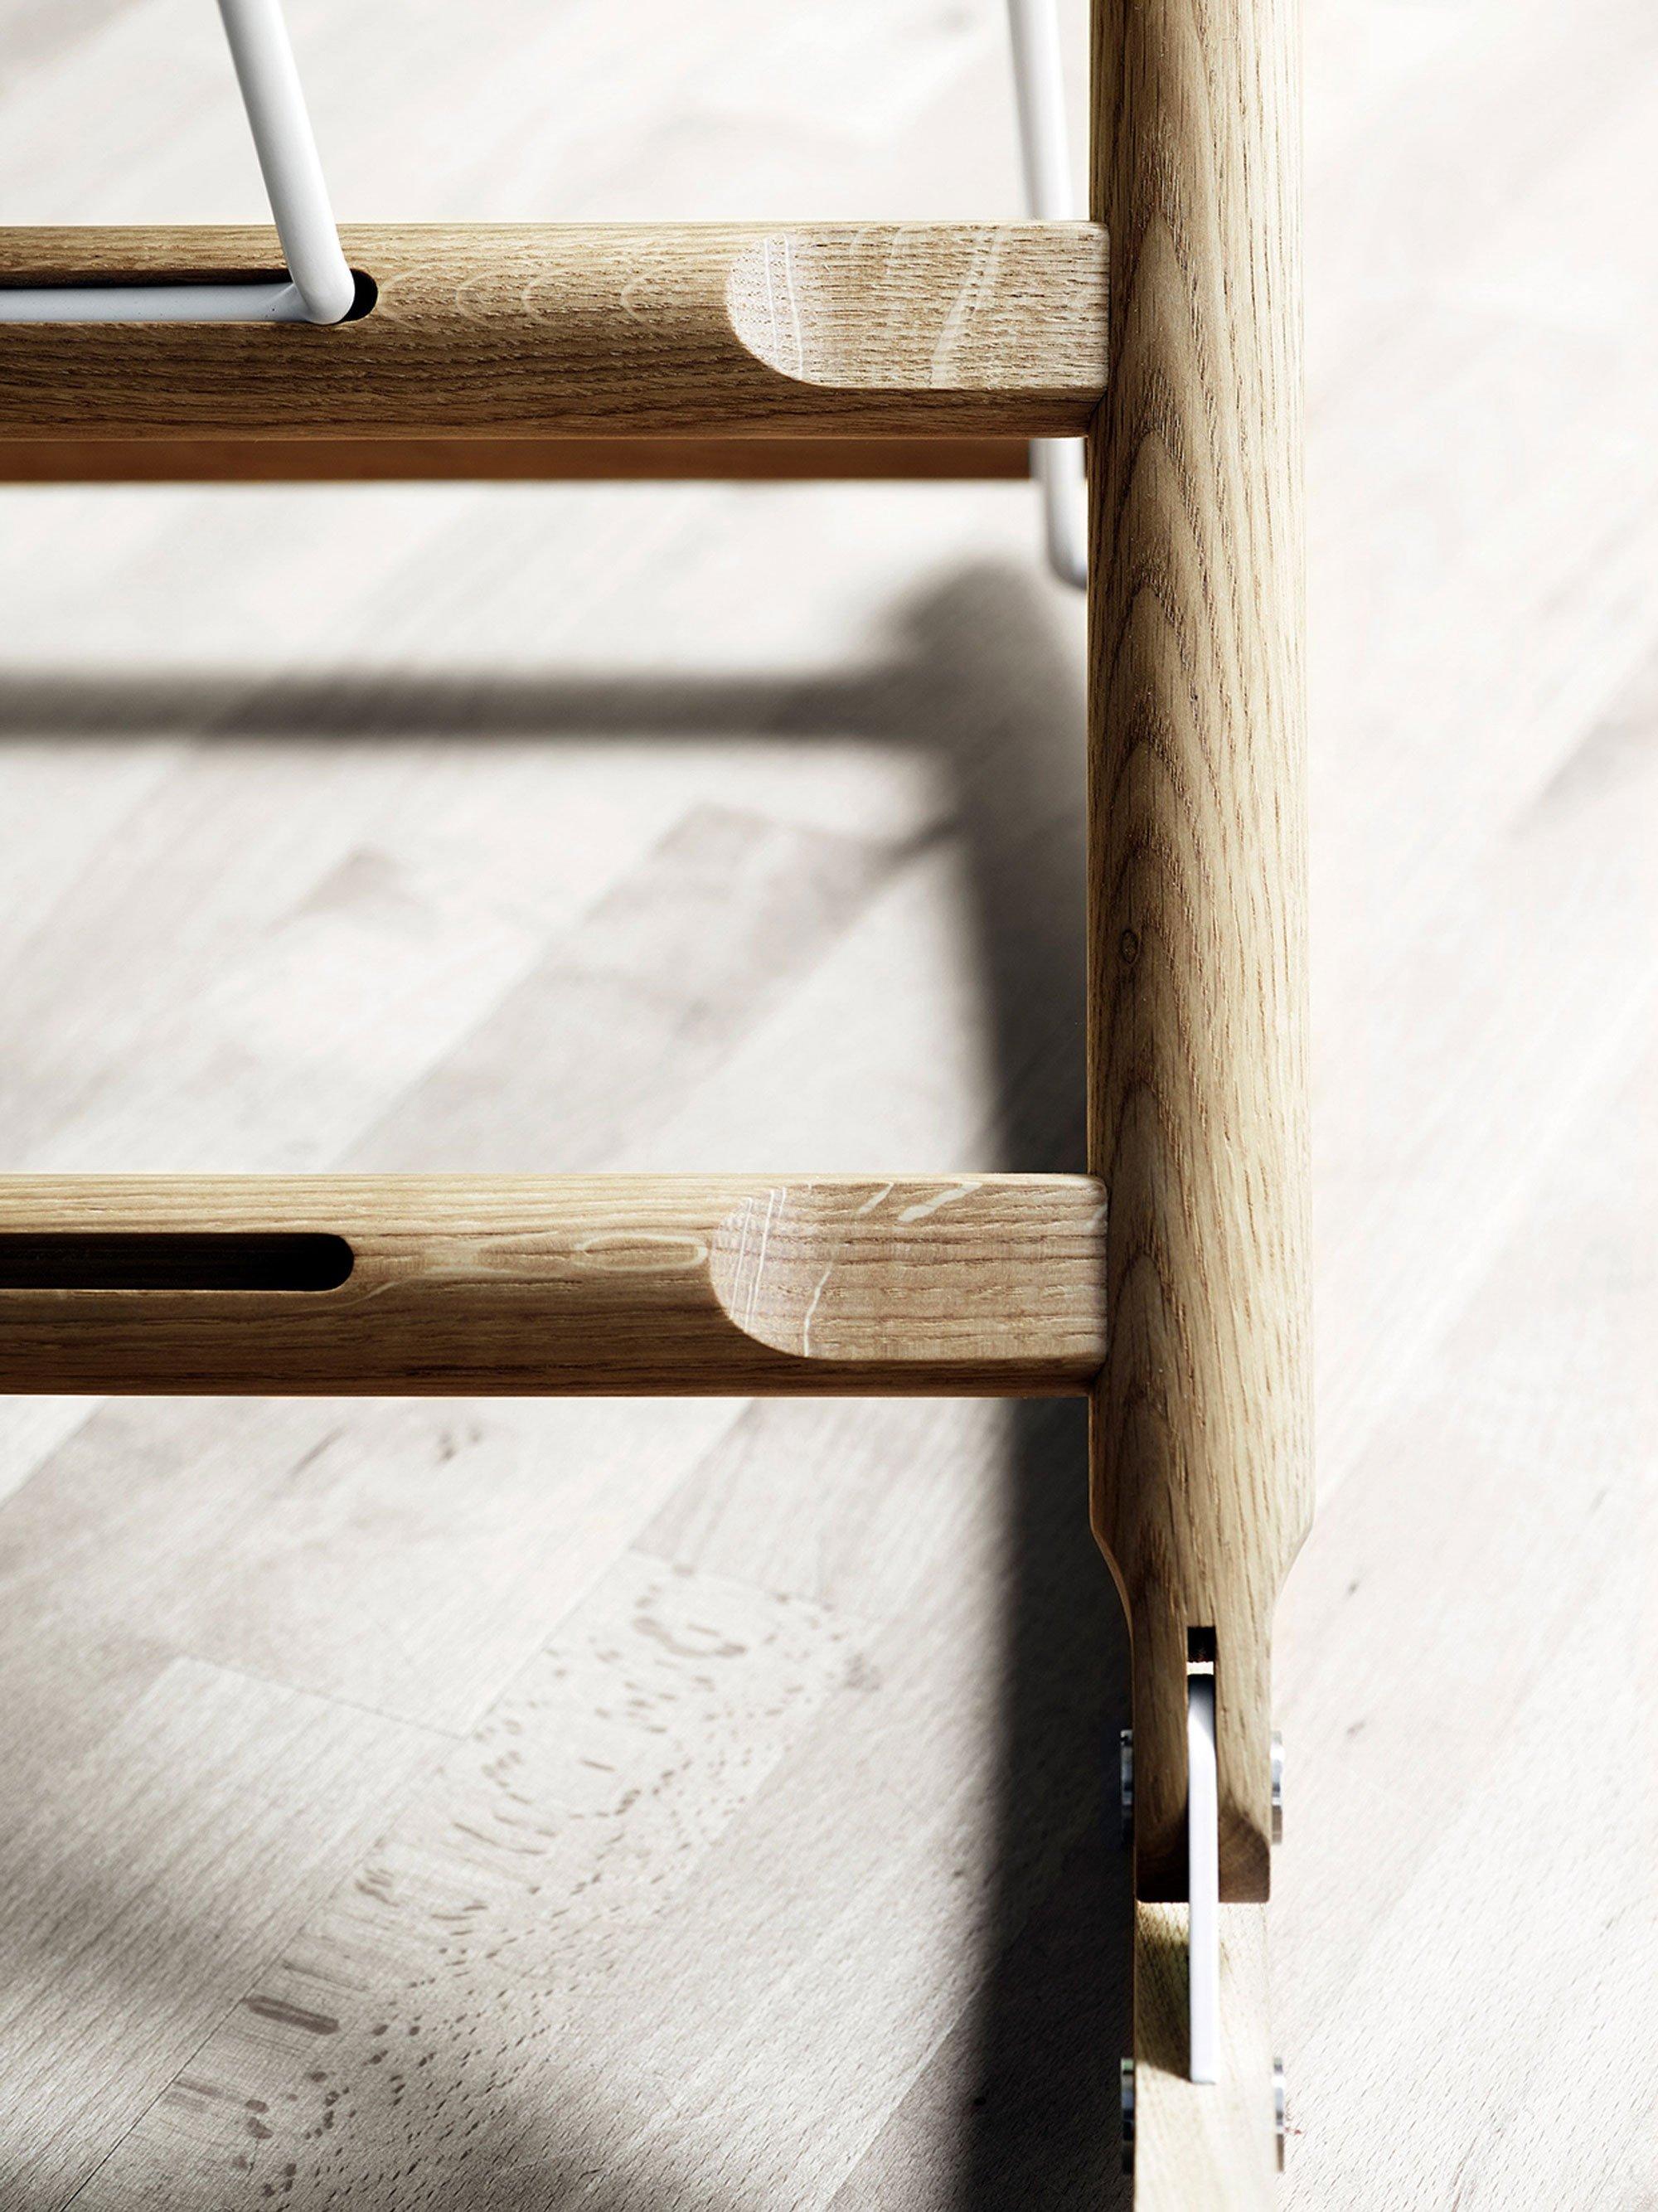 Rocking Nest Chair By Anker Bak For Carl Hansen & Son